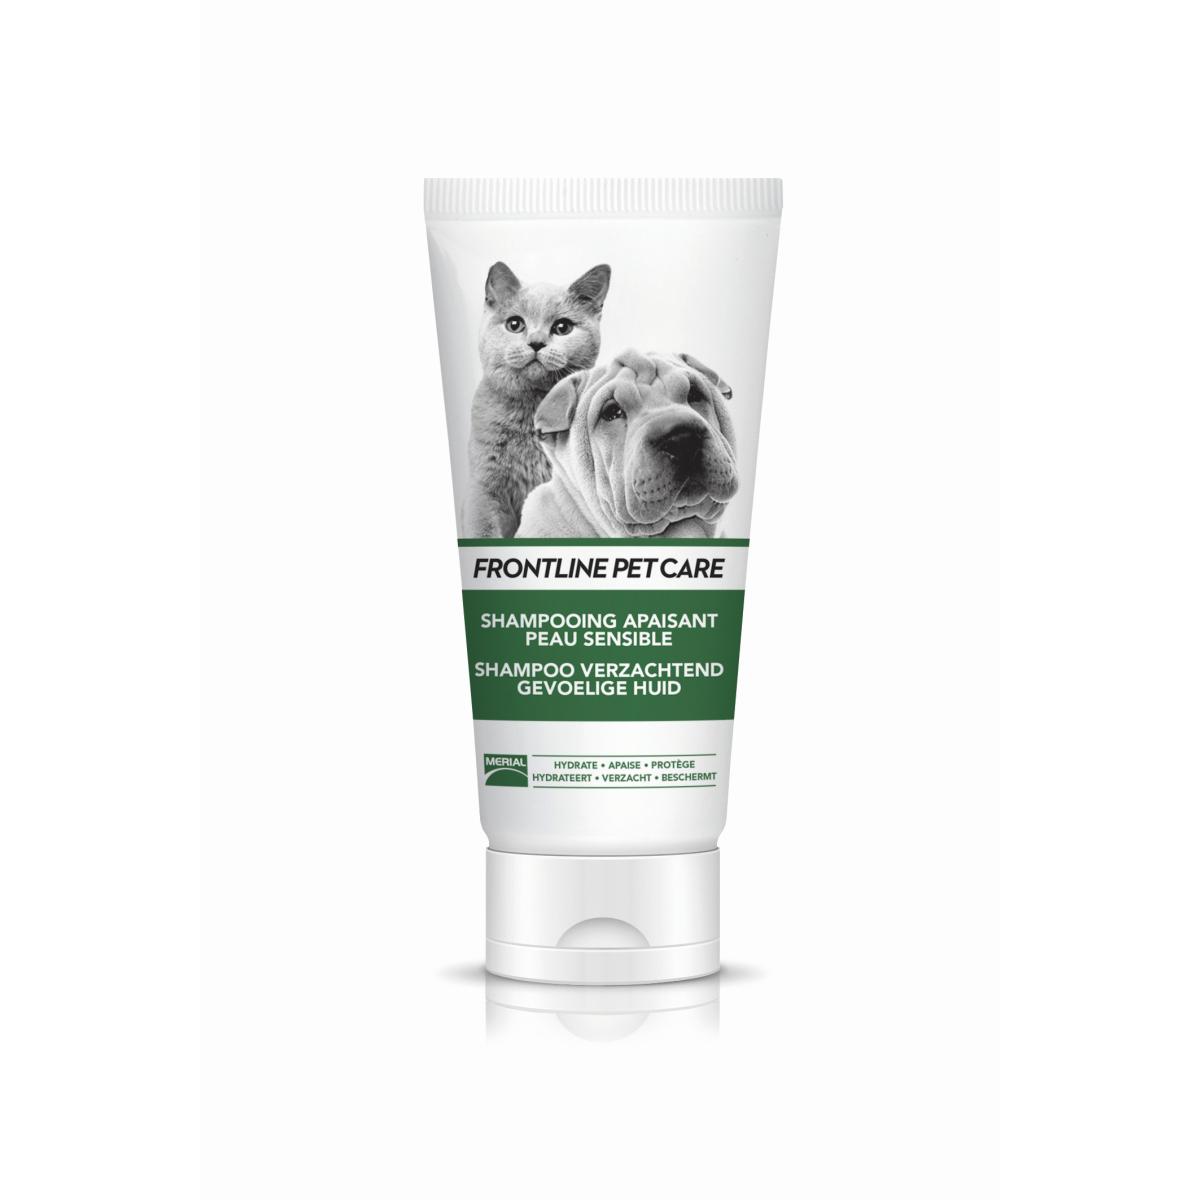 Pet care shampoo verzachtend gevoelige huid wit/groen 200 ml